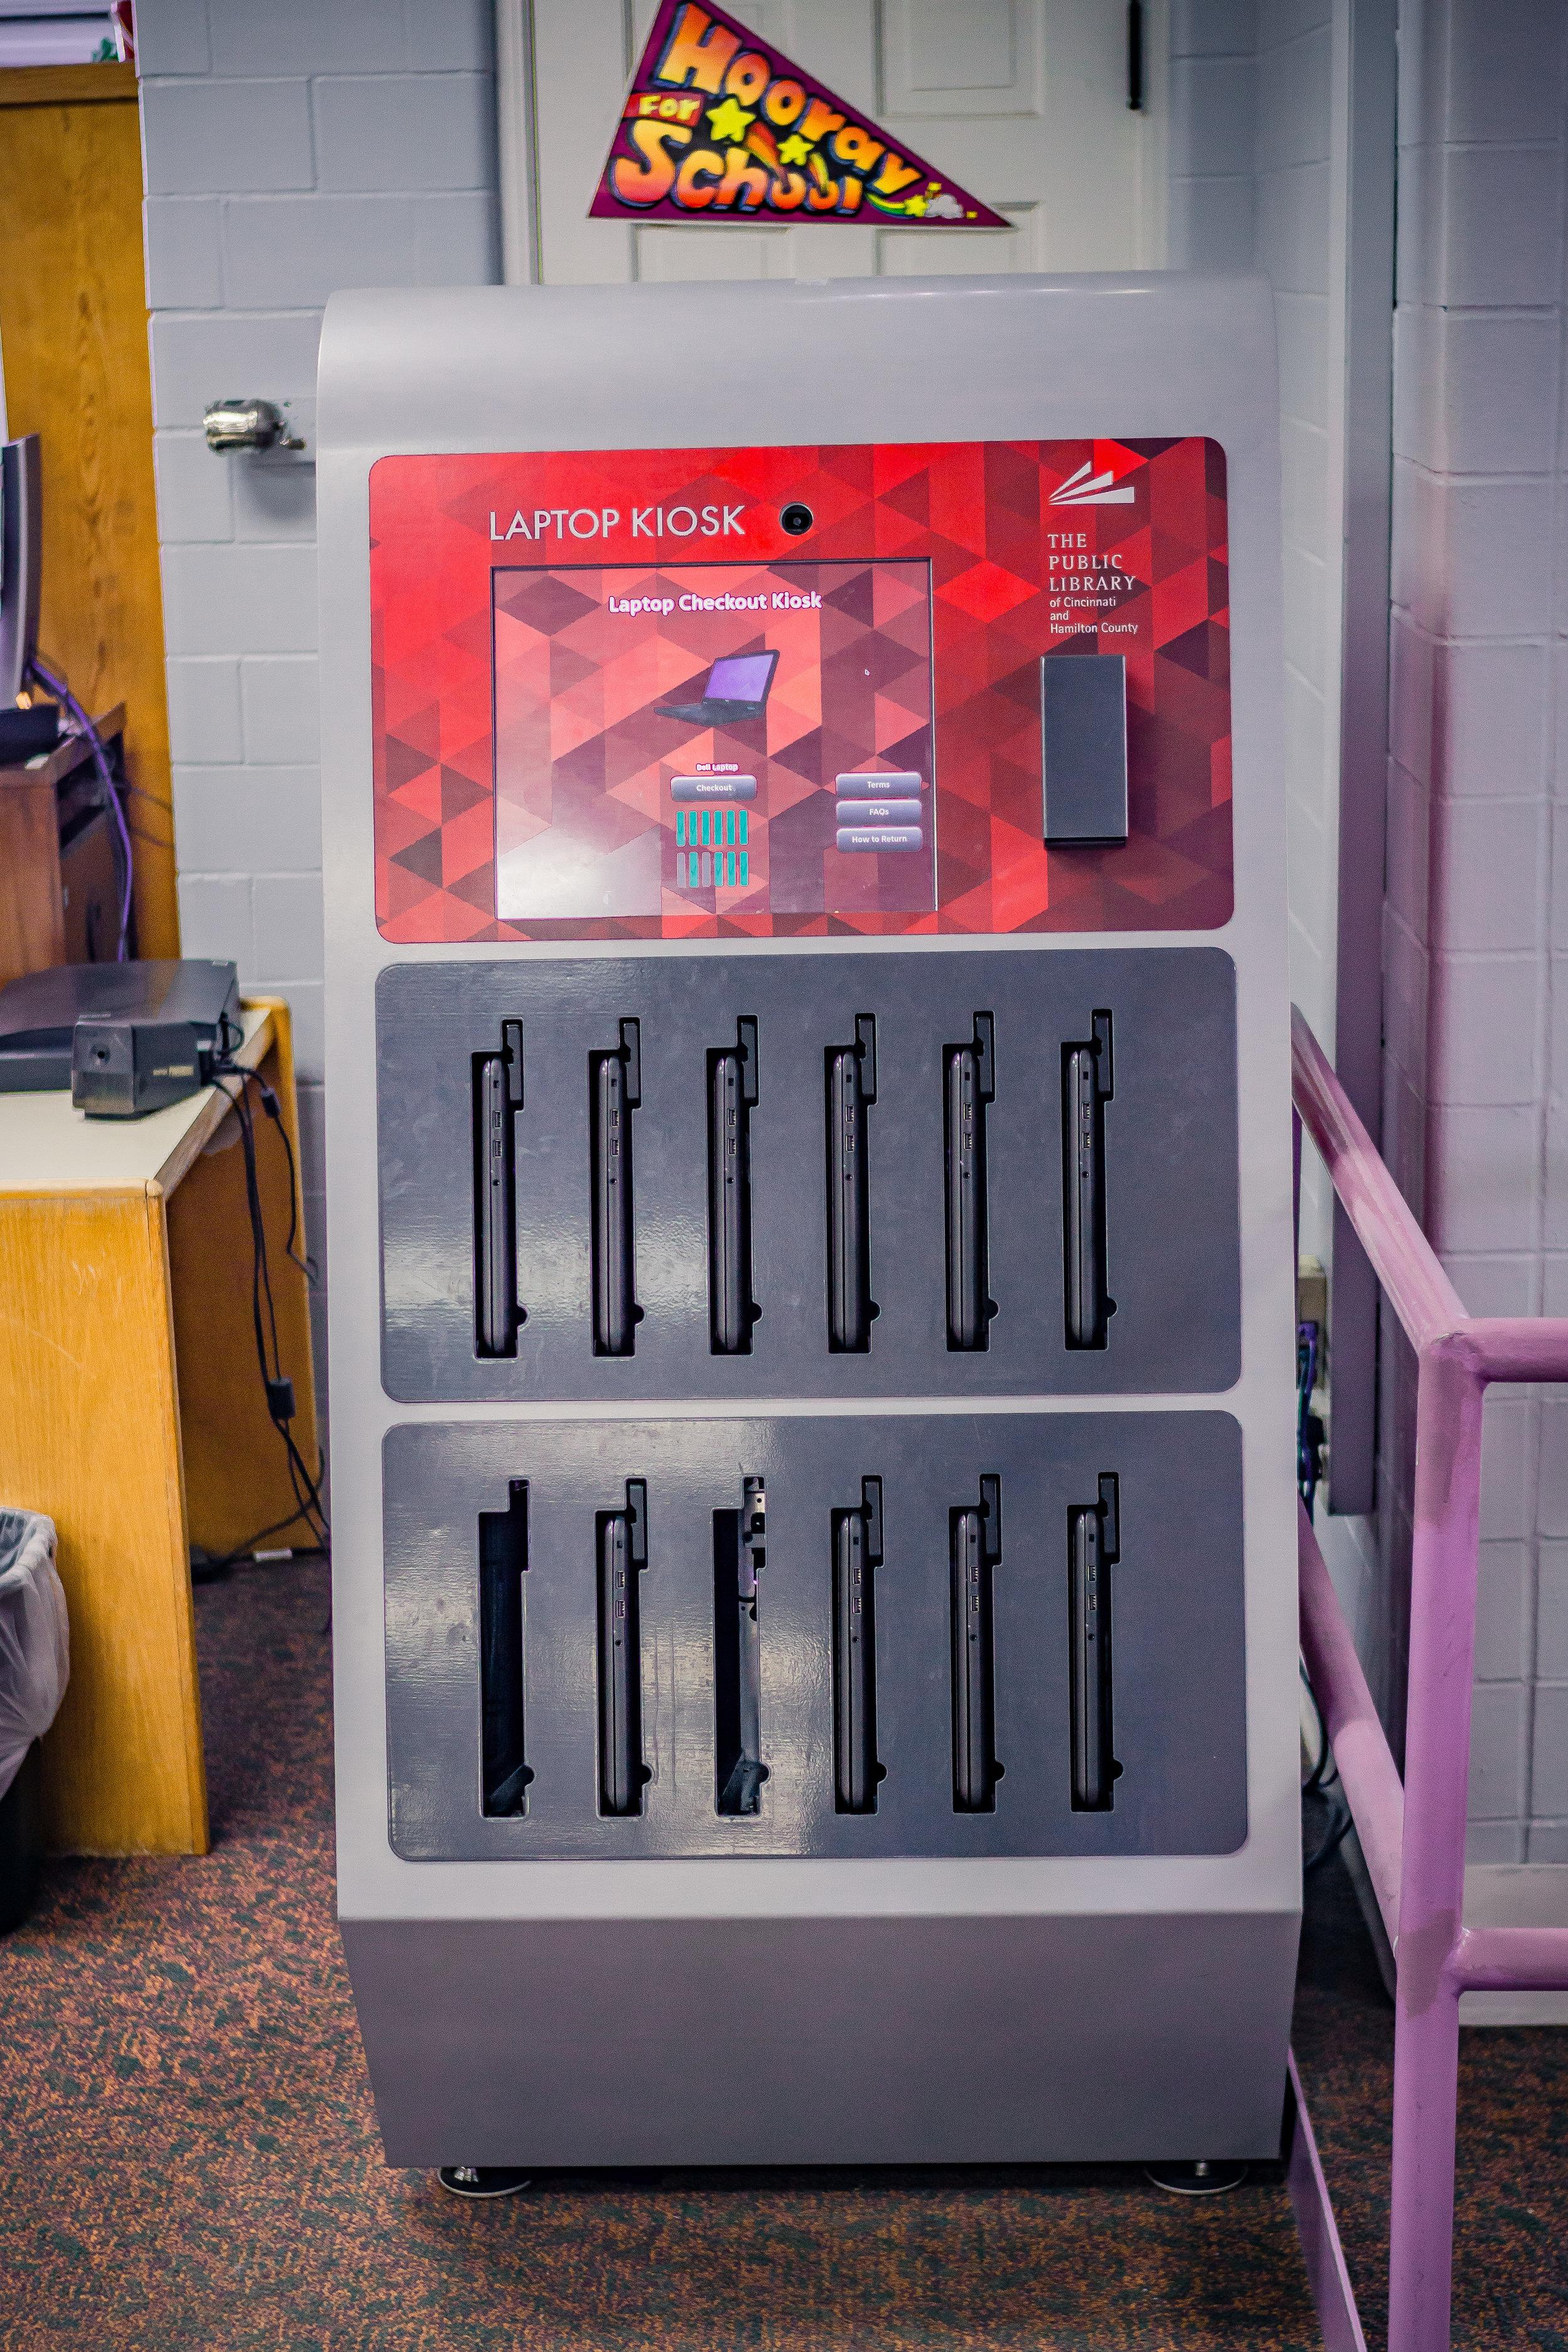 Laptop kiosk at Mt. Healthy Library Branch / photo by Salvador Mendoza